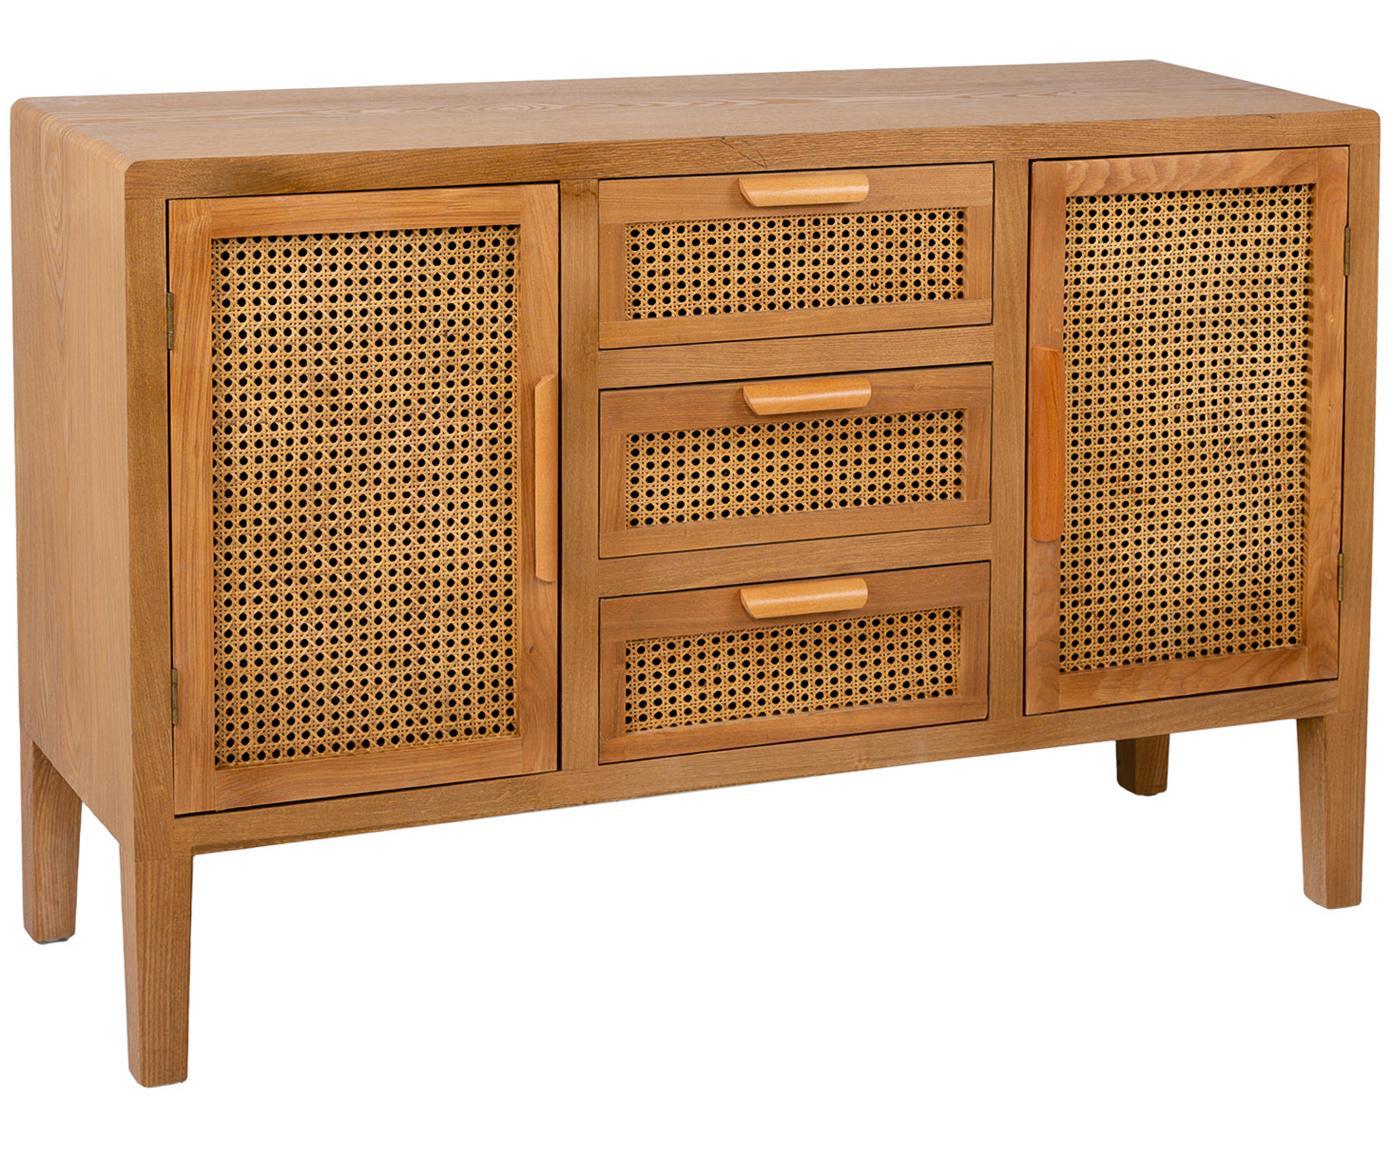 Aparador Manuela, Estructura: madera de abeto, tablero , Marrón, An 122 x Al 82 cm